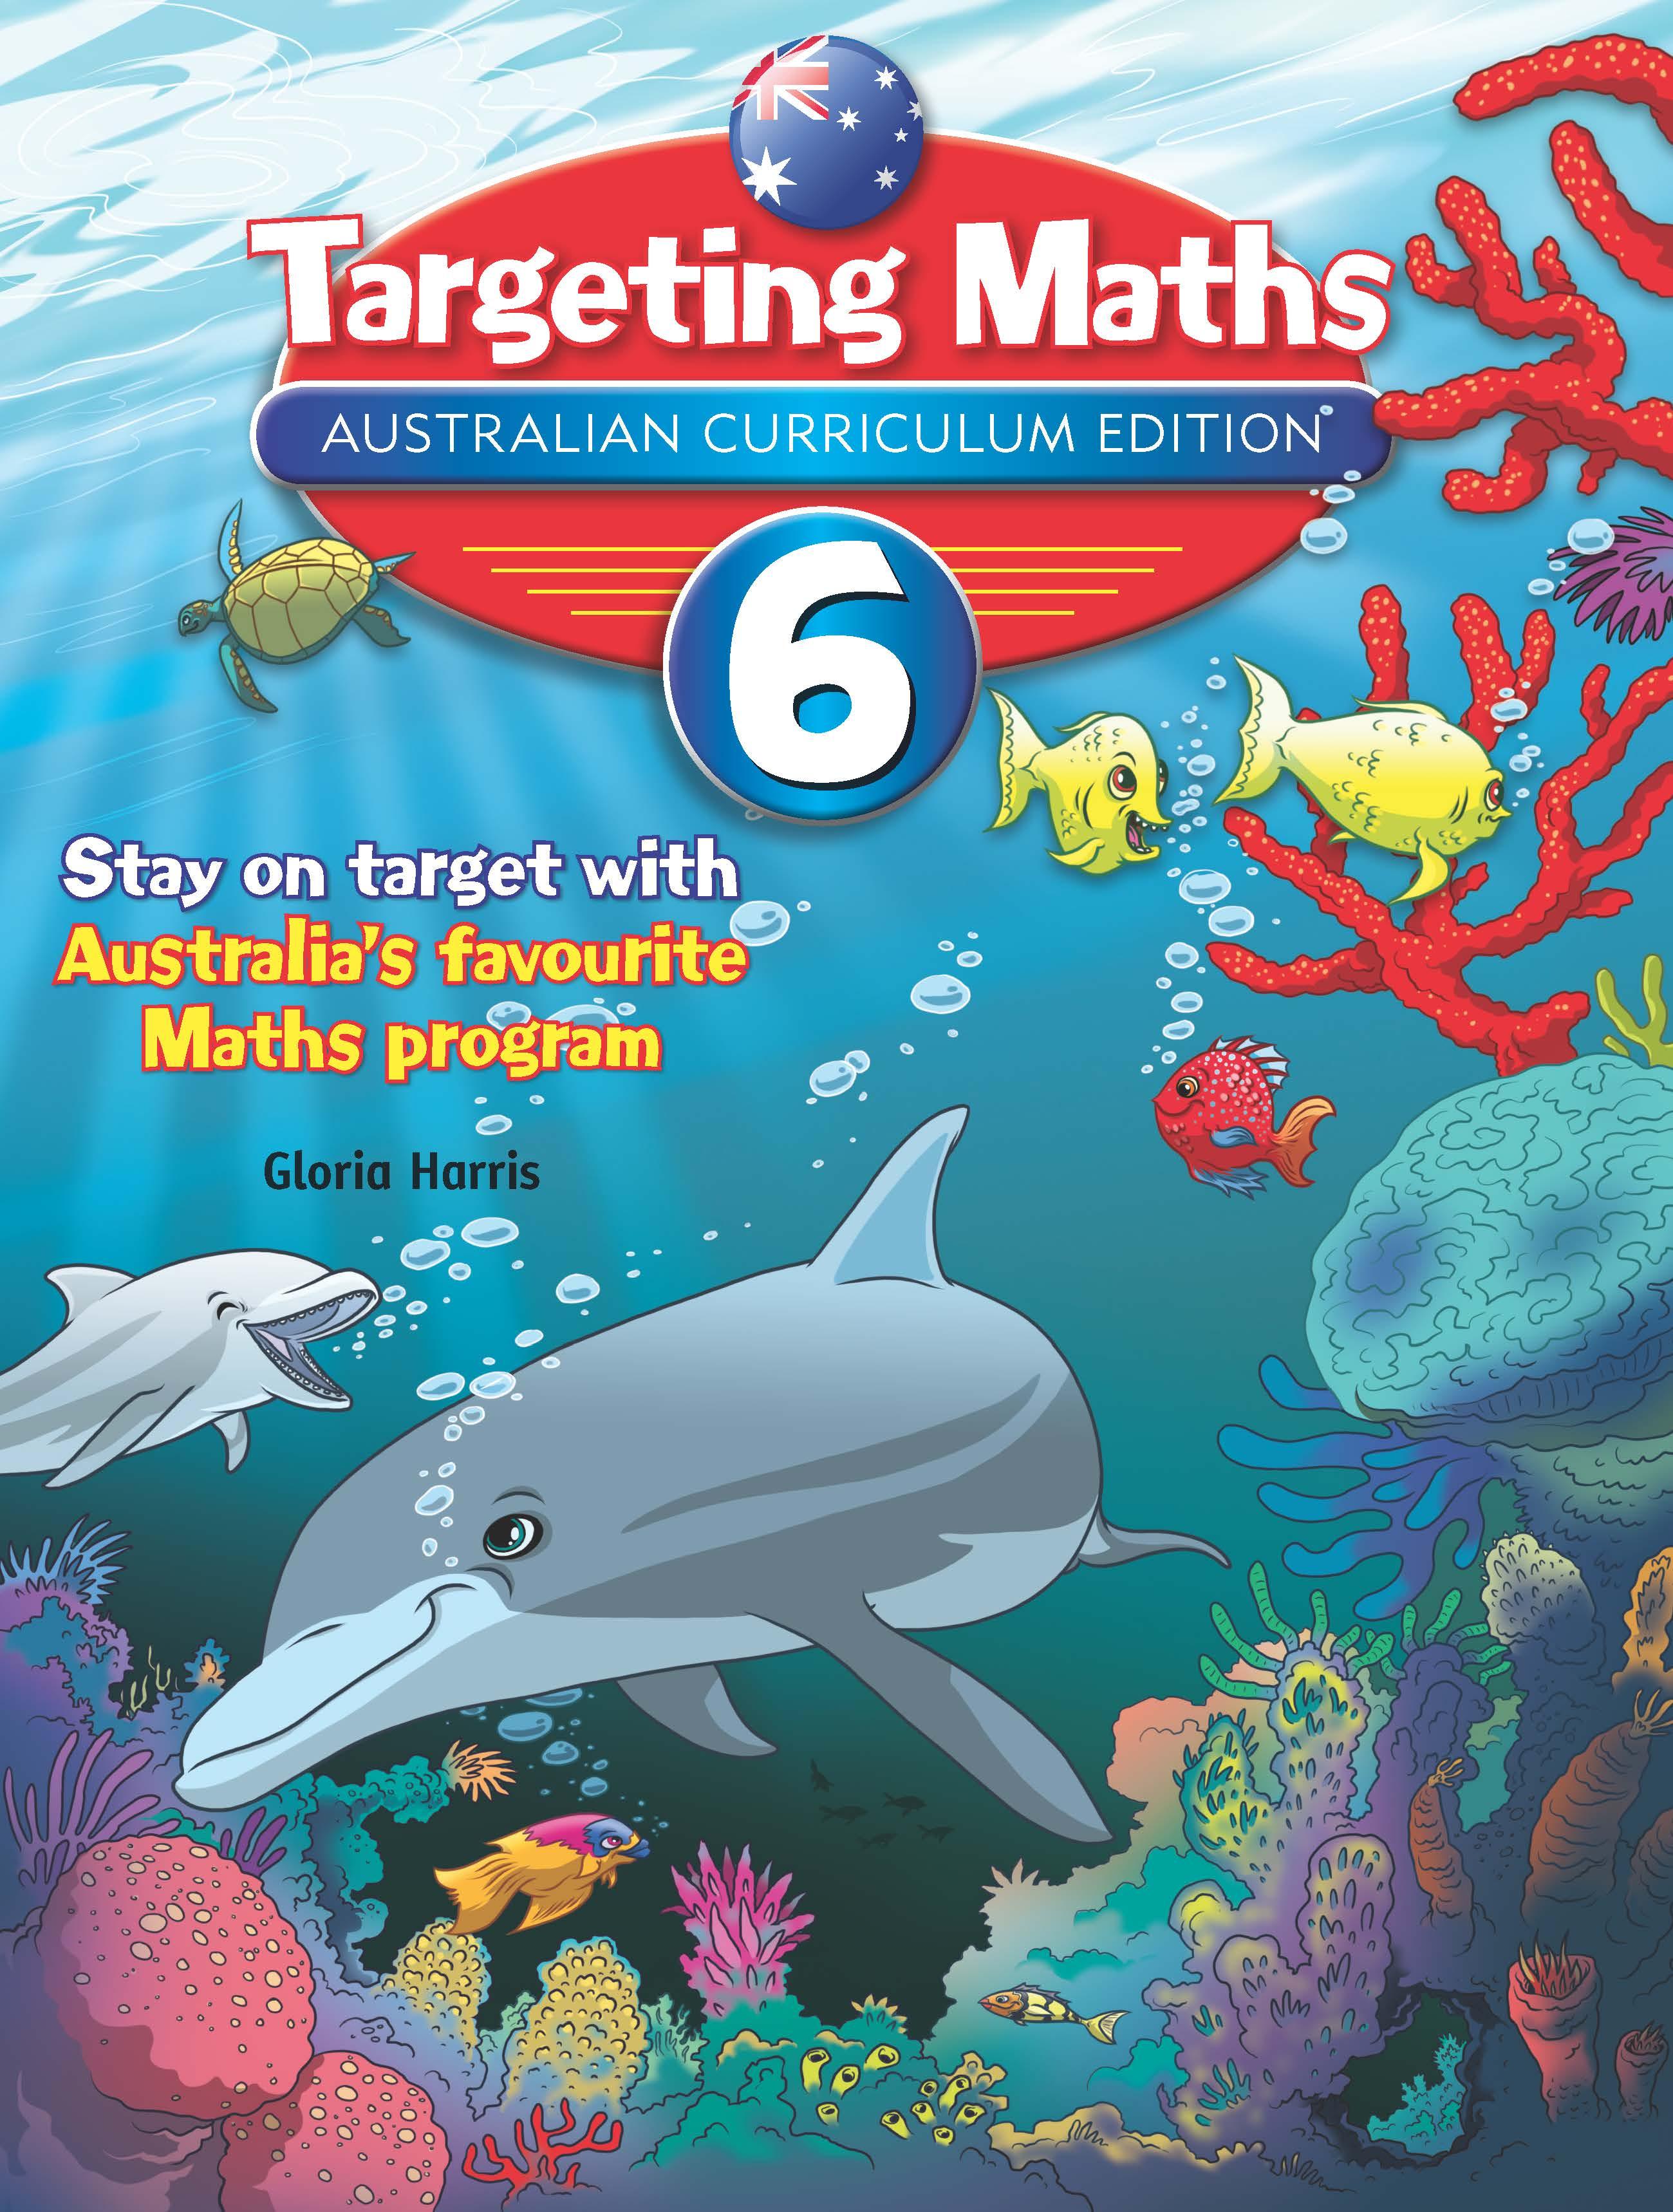 Targeting Maths Australian Curriculum Edition Student Book Year 6